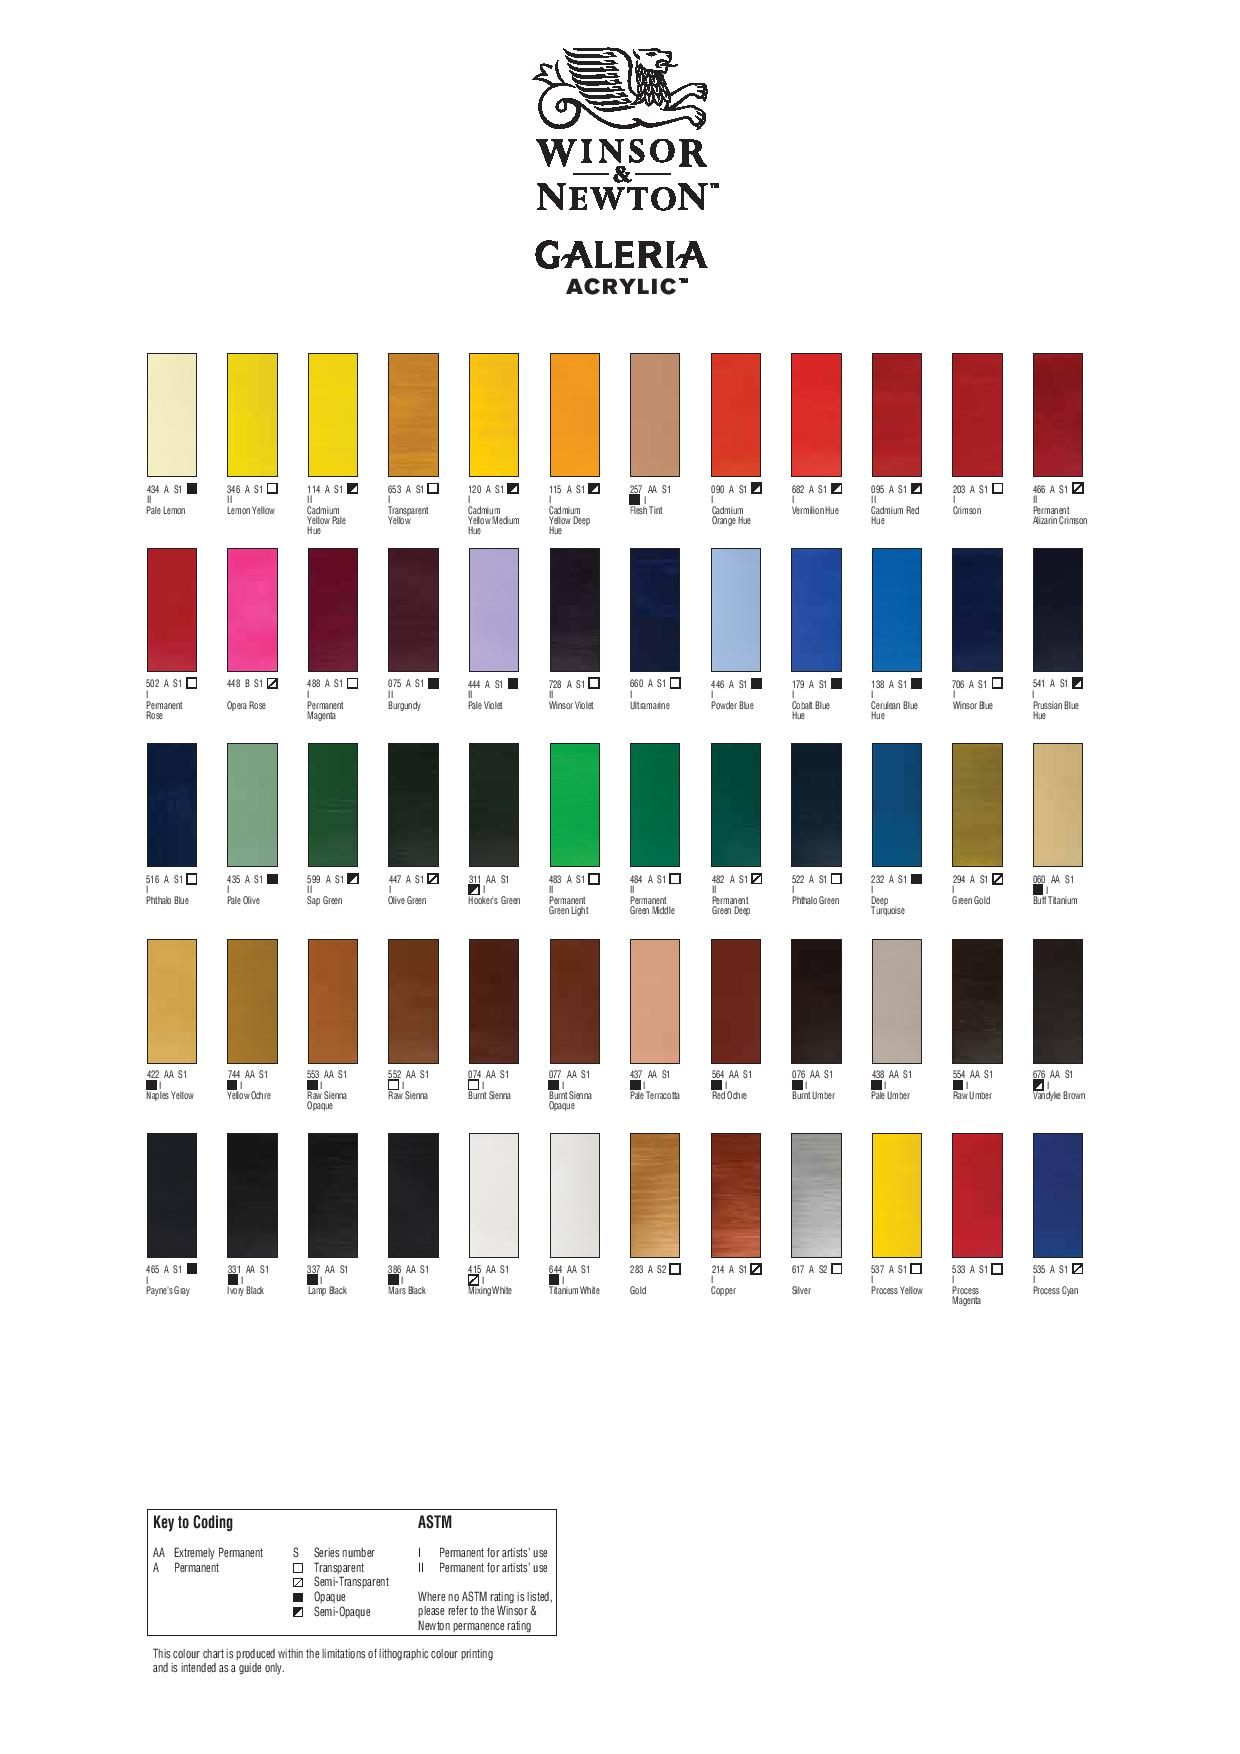 Best Smps Colour Wire Voltage Chart Images - Electrical Diagram ...